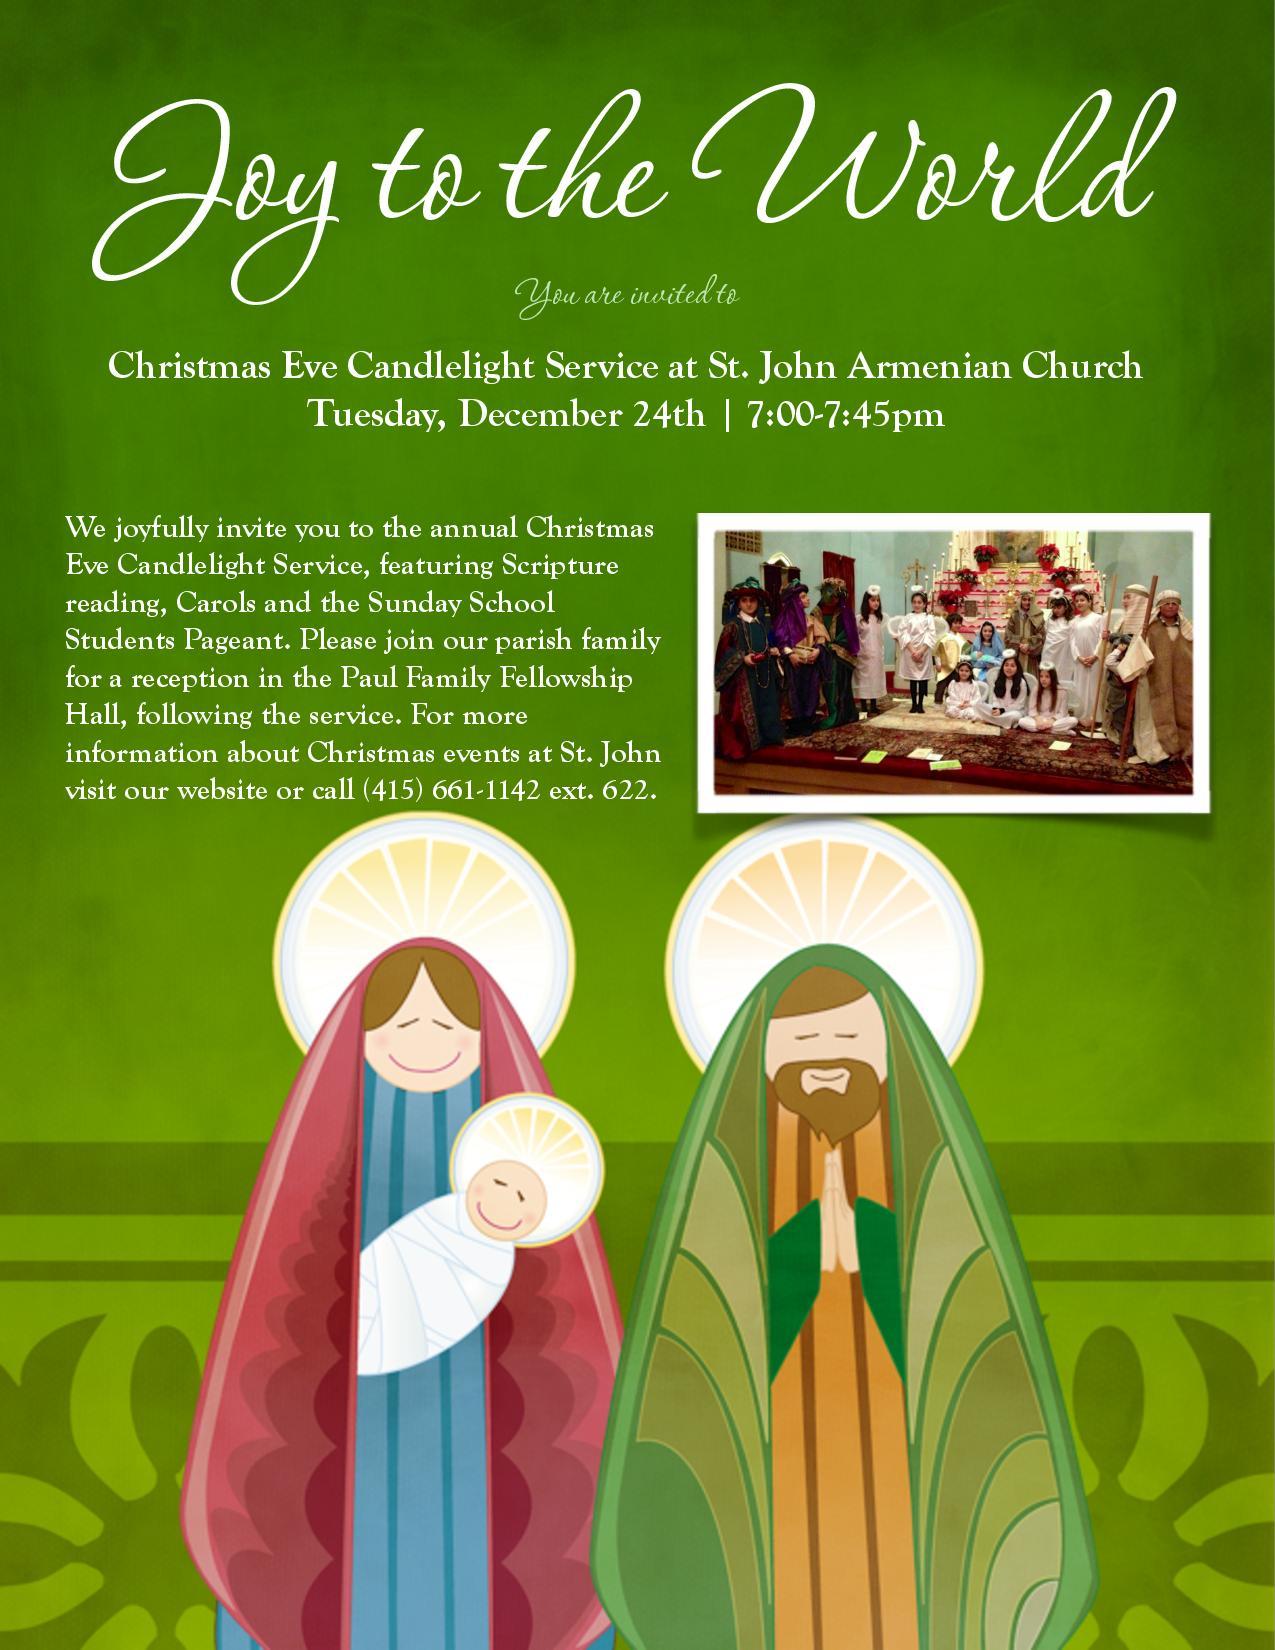 St Johns Christmas Pageant 2020 St Johns Church Woking Christmas Services San Diego | Kdumnk